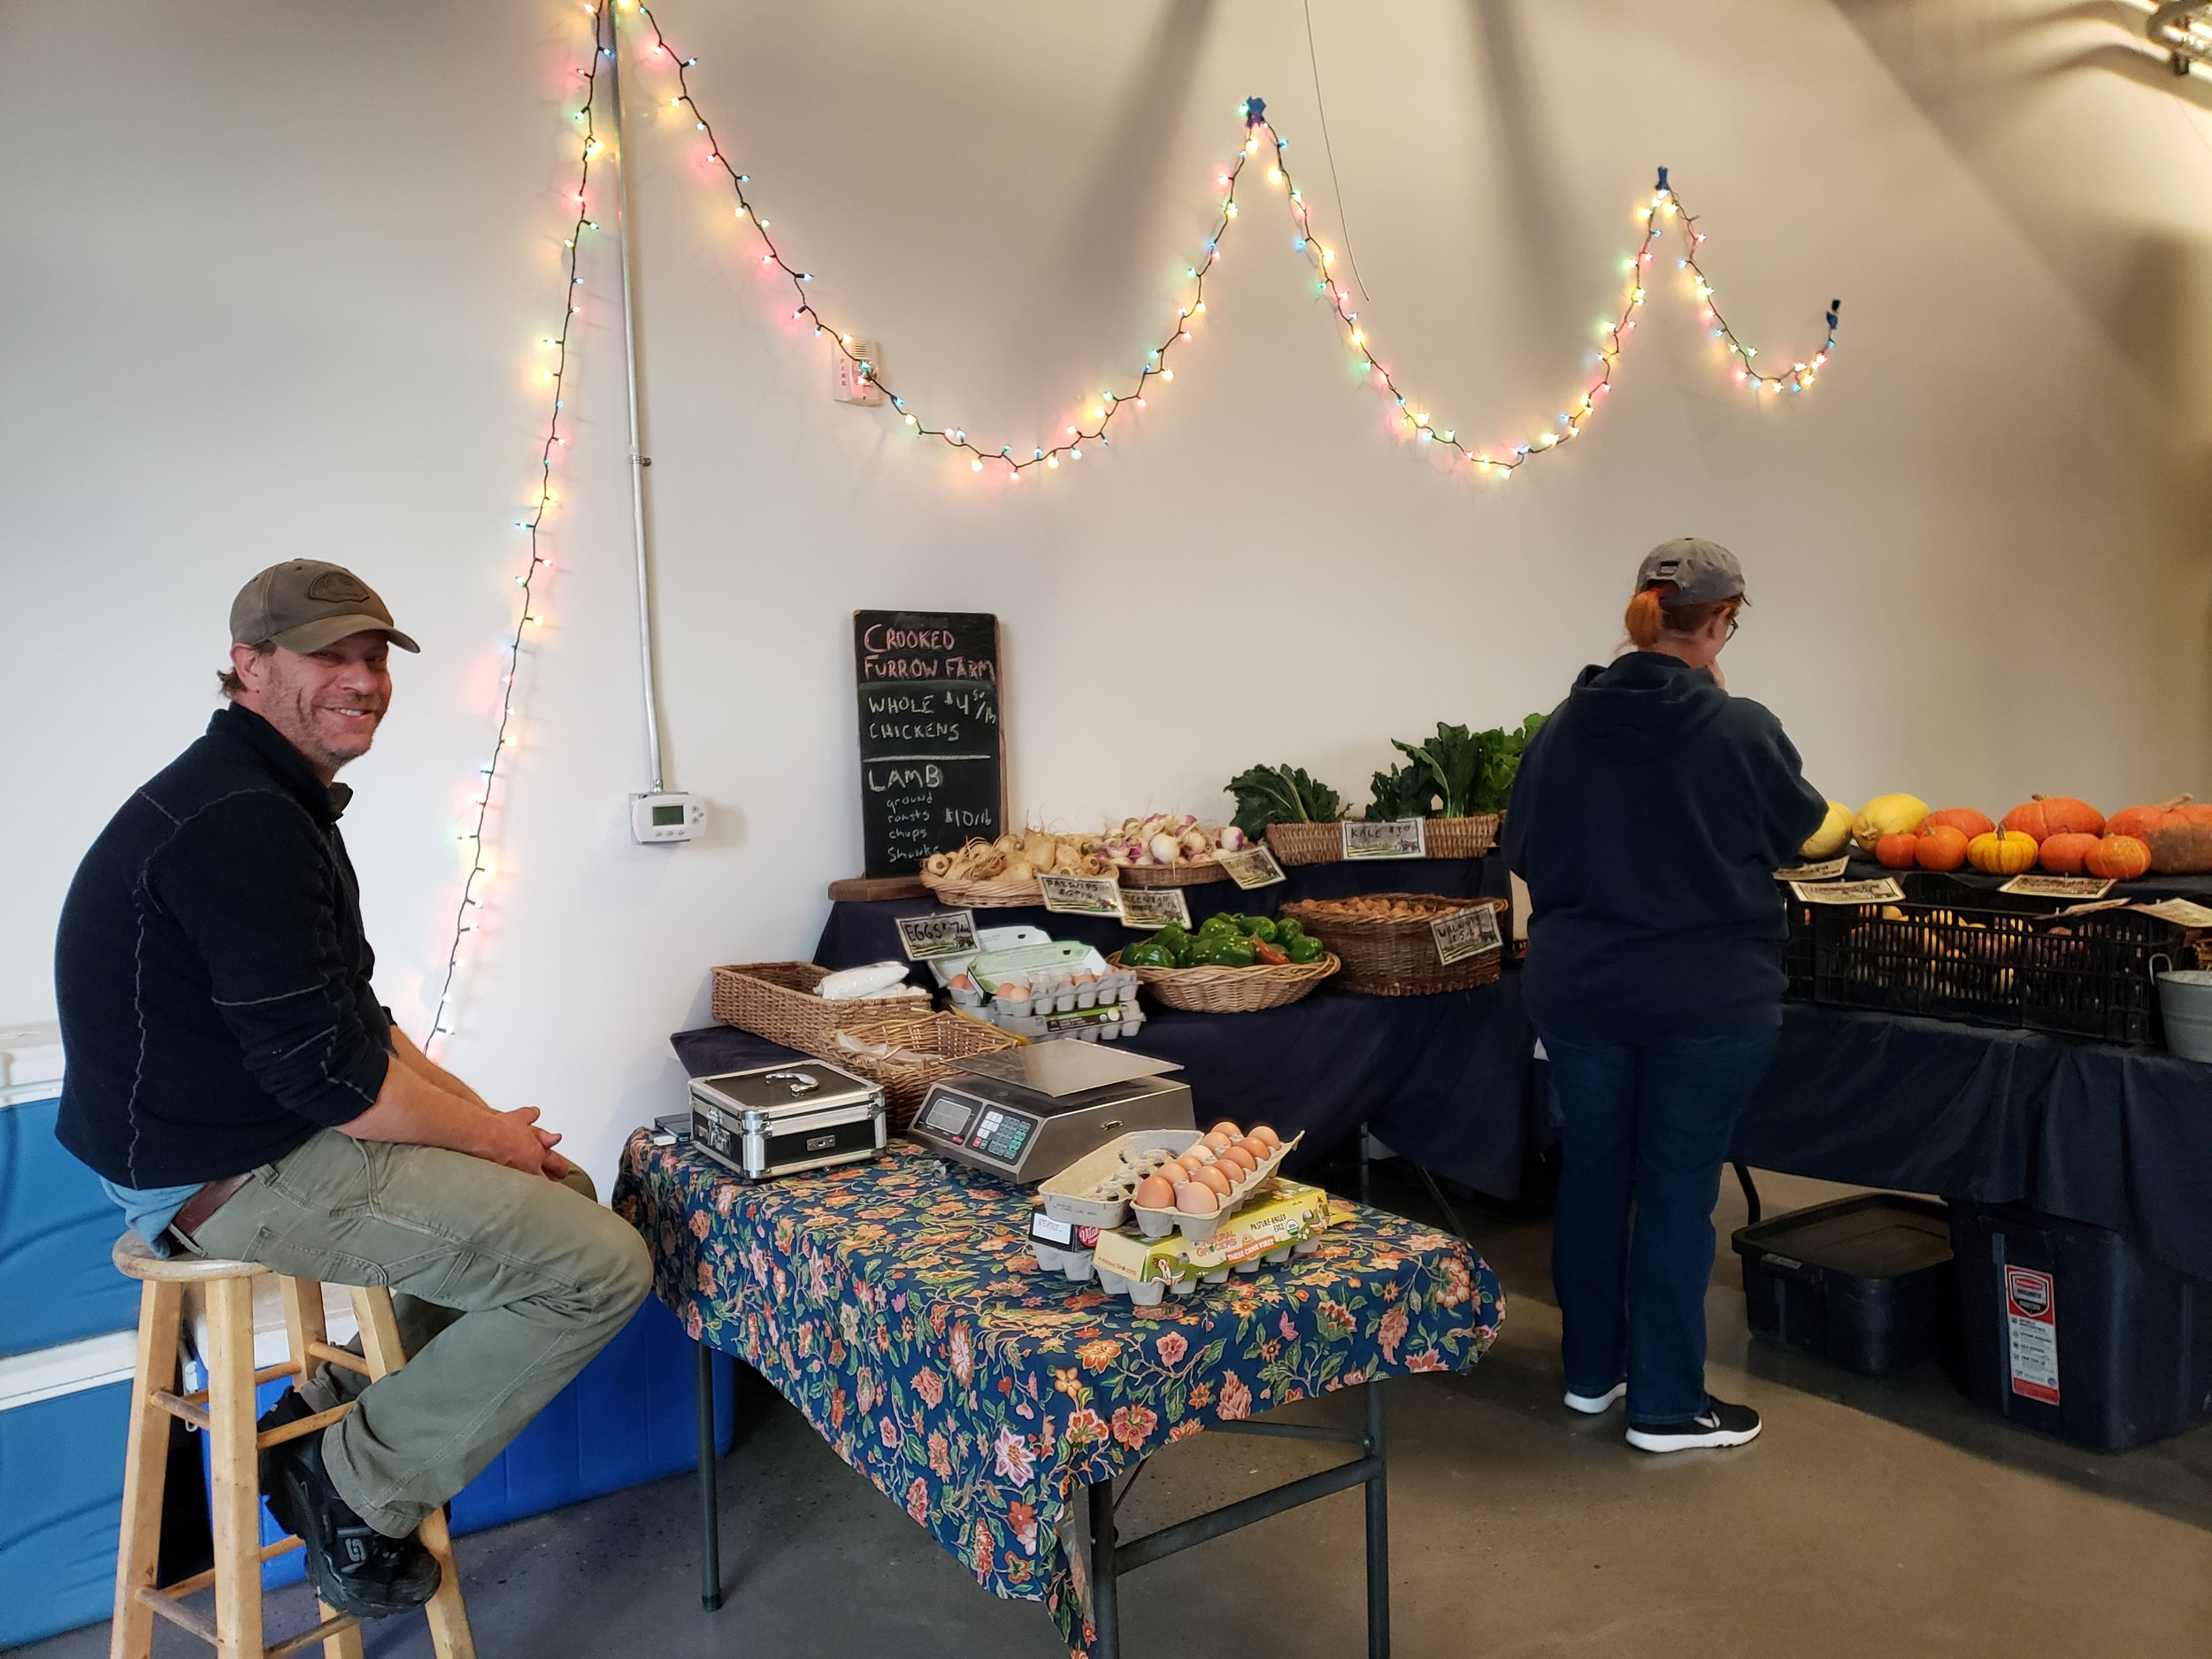 Crooked Furrow Farm had farm fresh eggs, frozen lamb, and plenty of winter veggies!